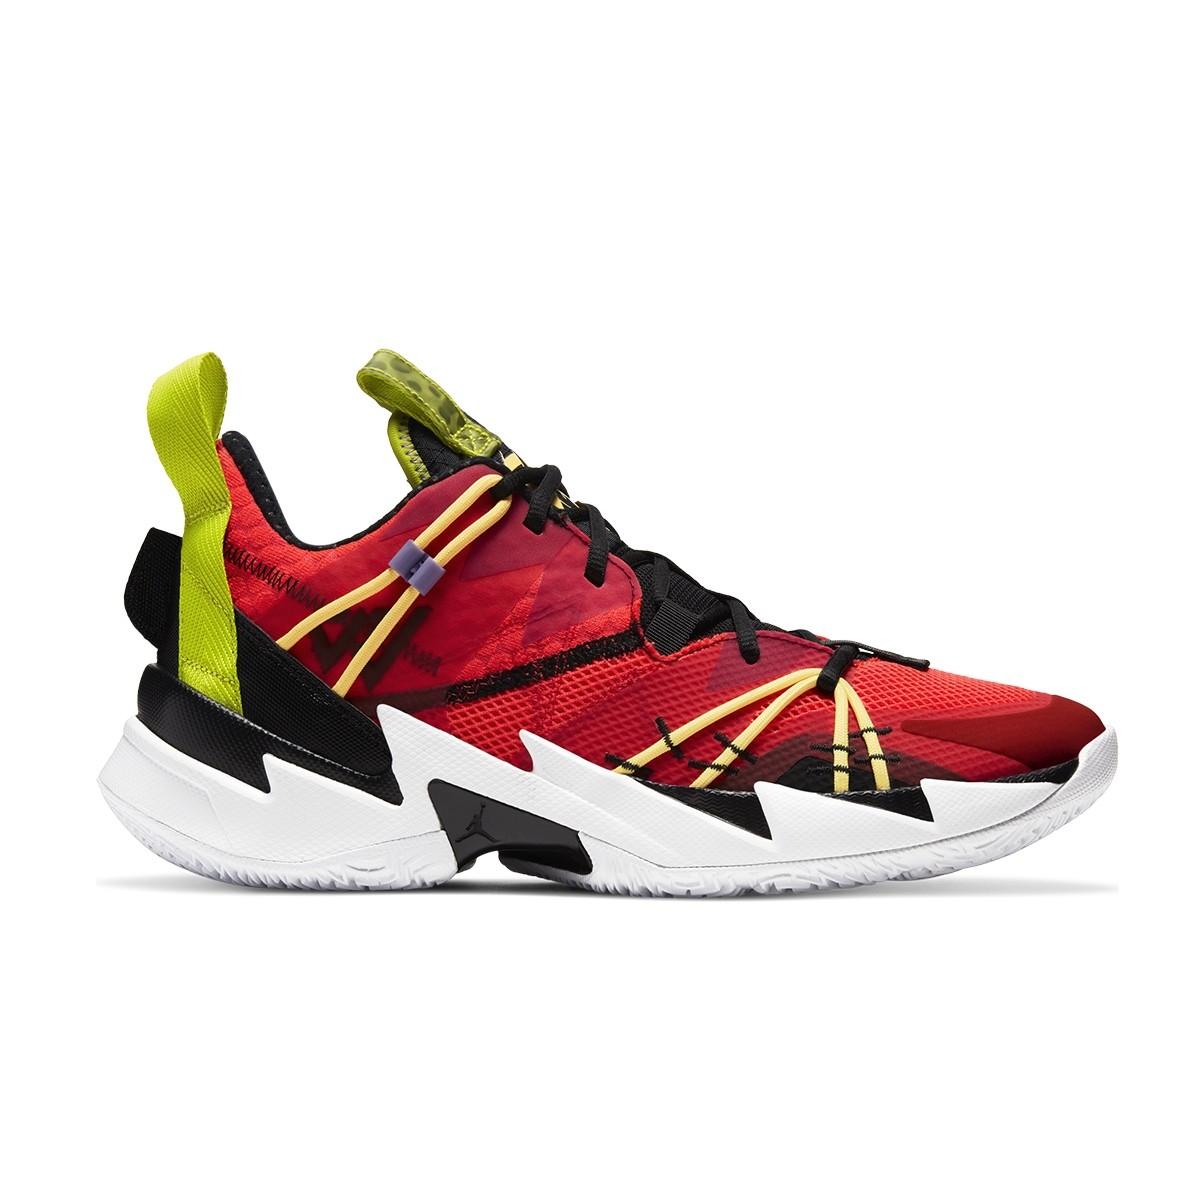 Jordan Why Not Zer0.3 SE GS 'Bright Crimson'